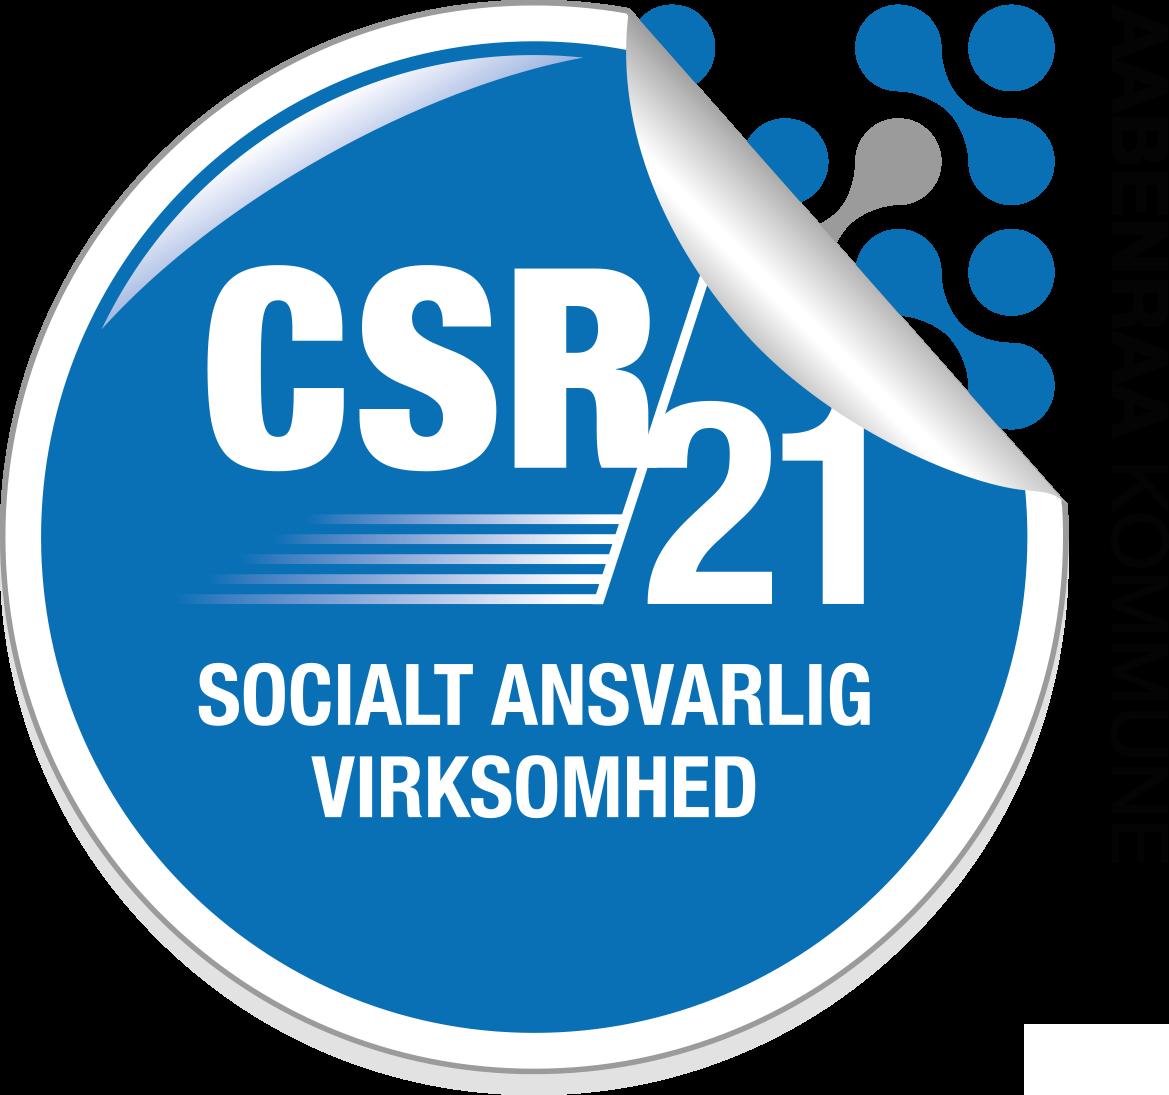 CSR 2021